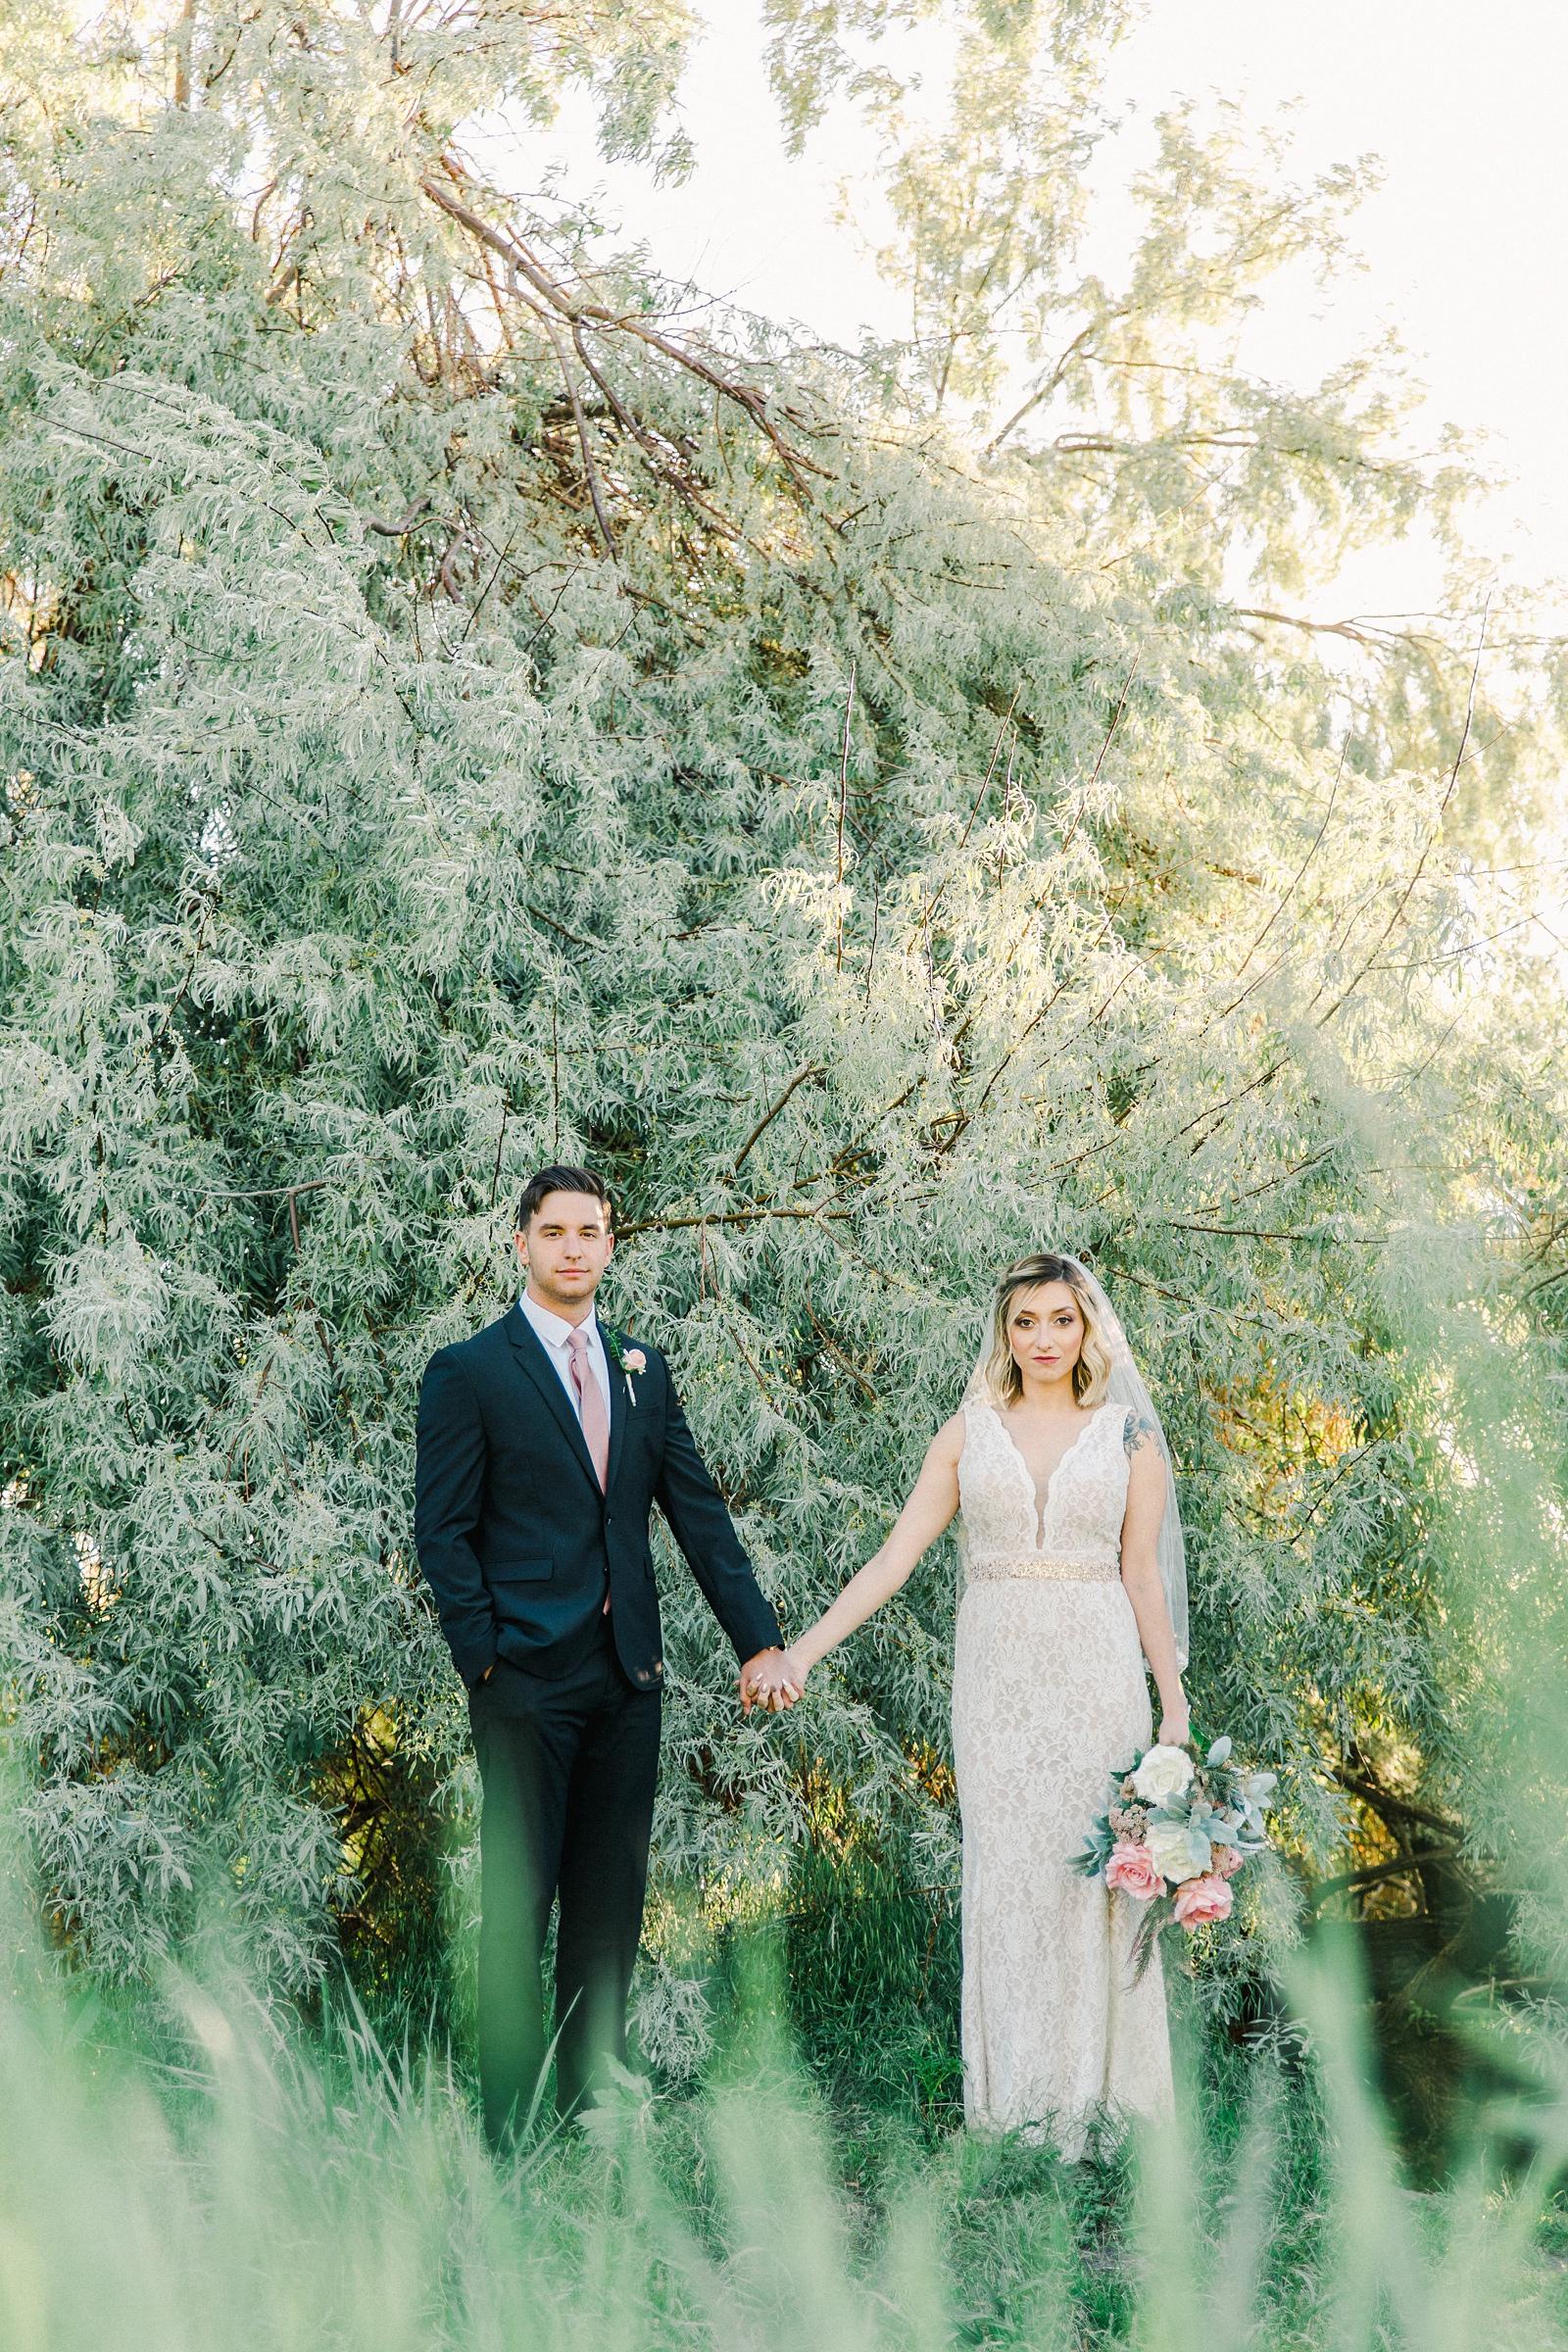 Salt Lake City Utah Bridal Wedding Photography, Tunnel Springs Park, bride and groom